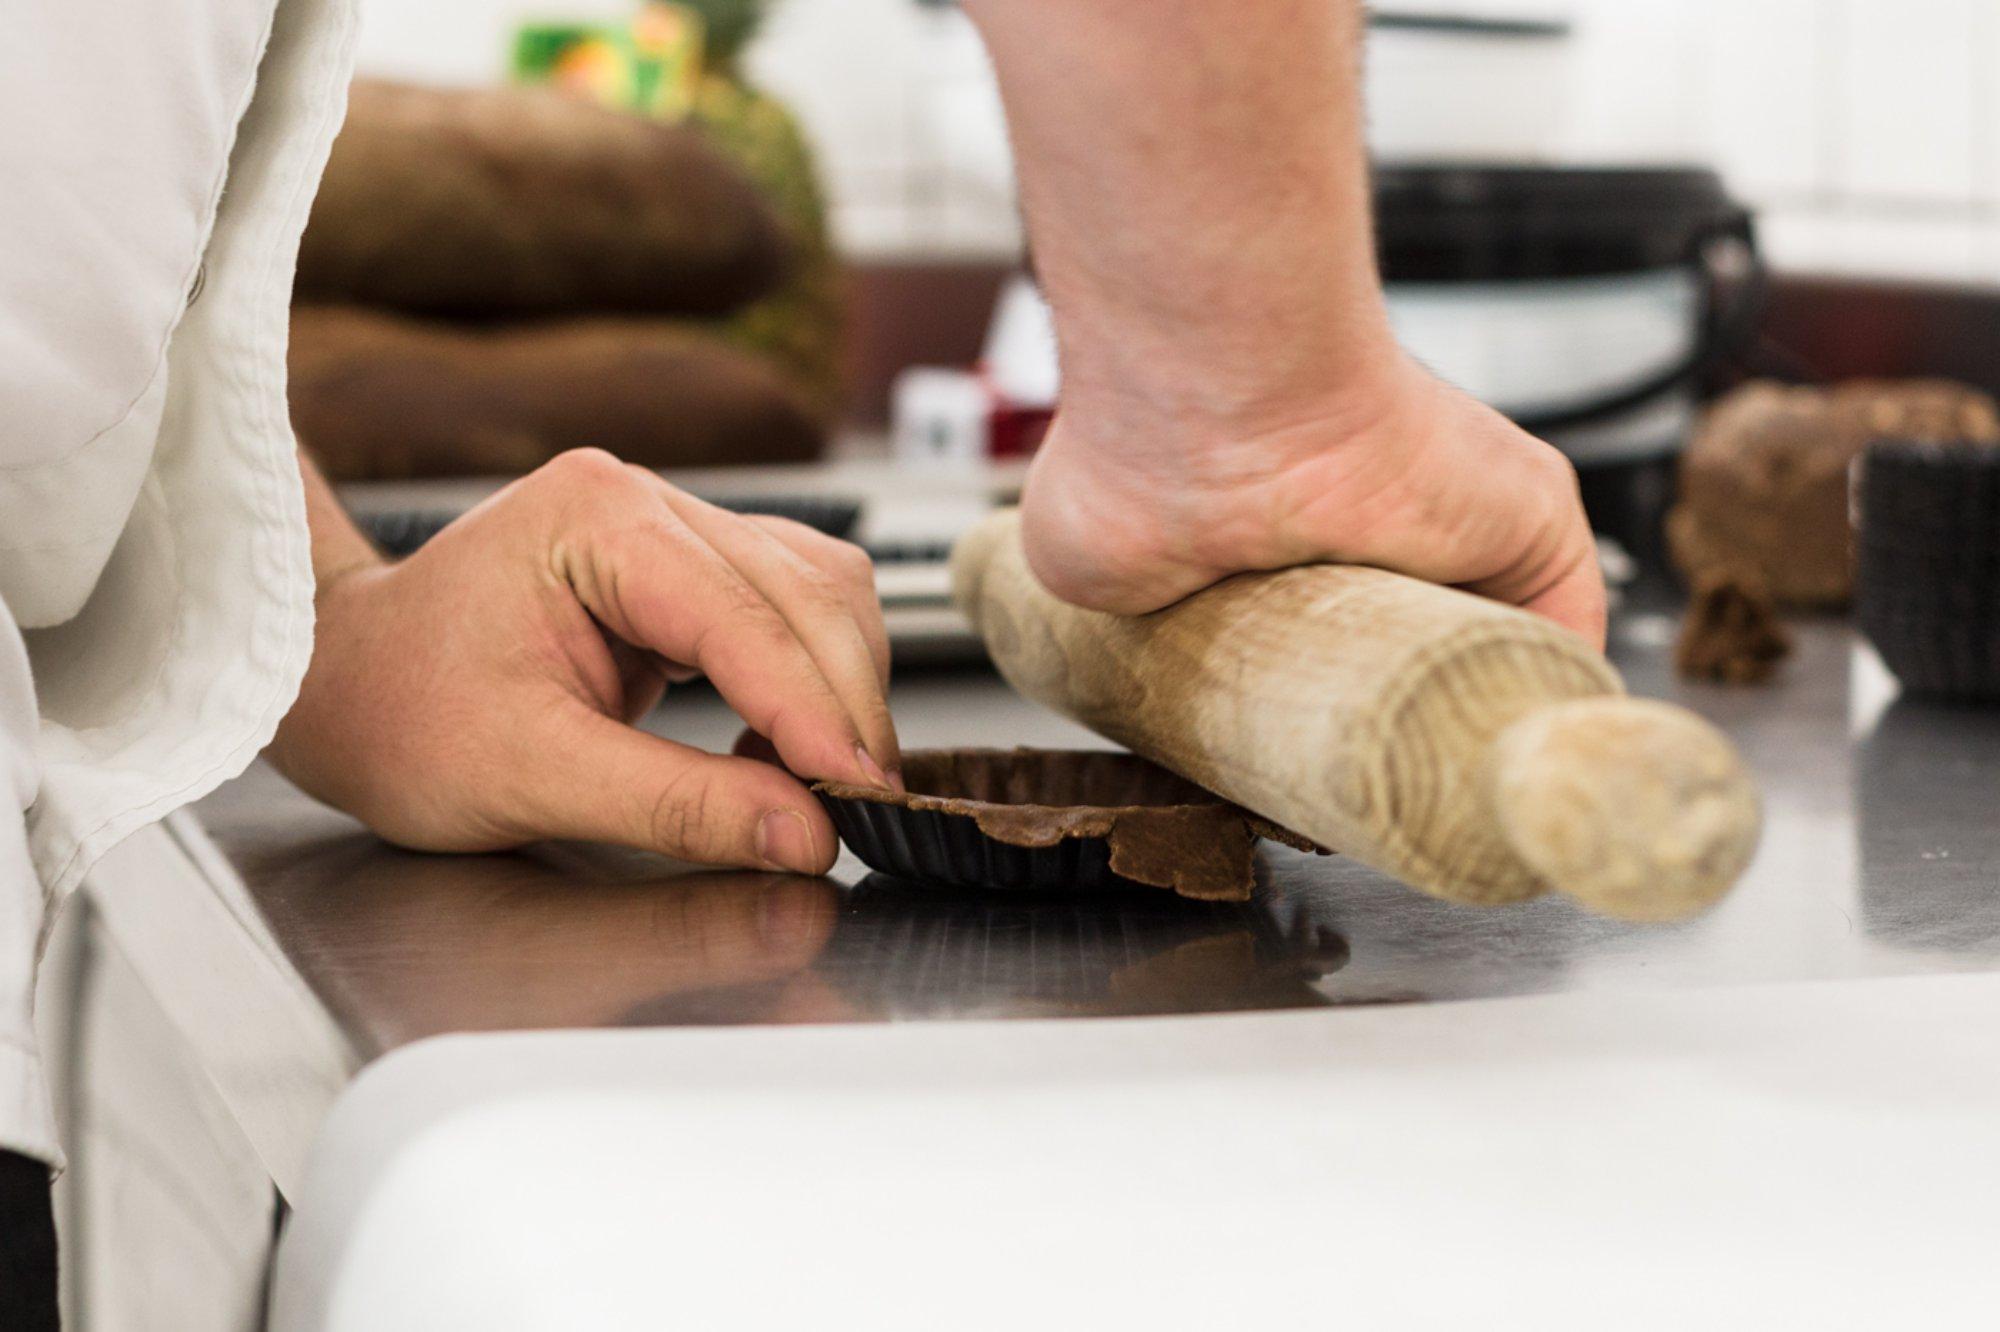 Restaurante 'Es Ventall': amasando las tartaletas de algarroba